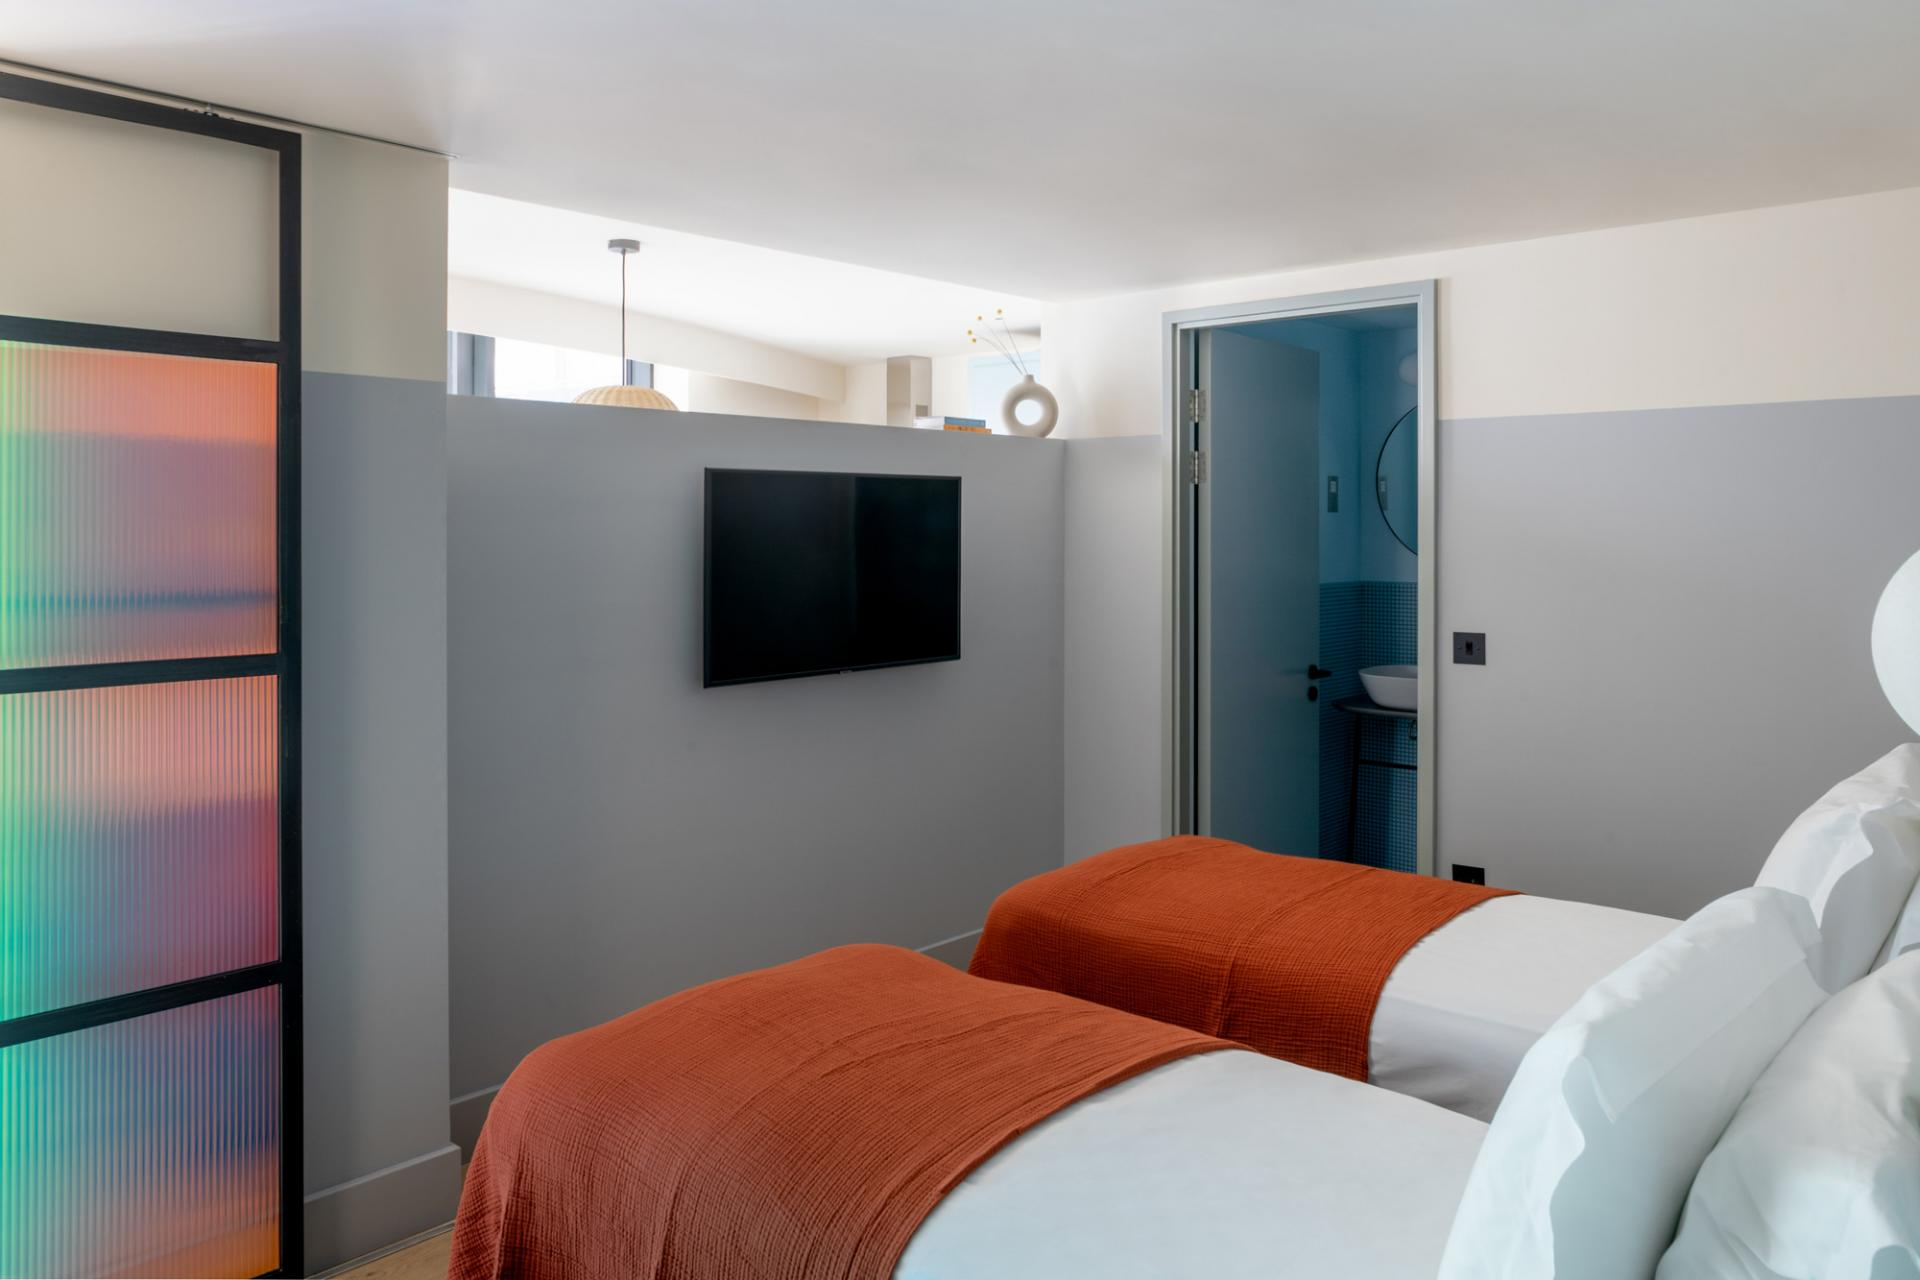 Twin beds Bermonds Locke, St Saviours Estate, London